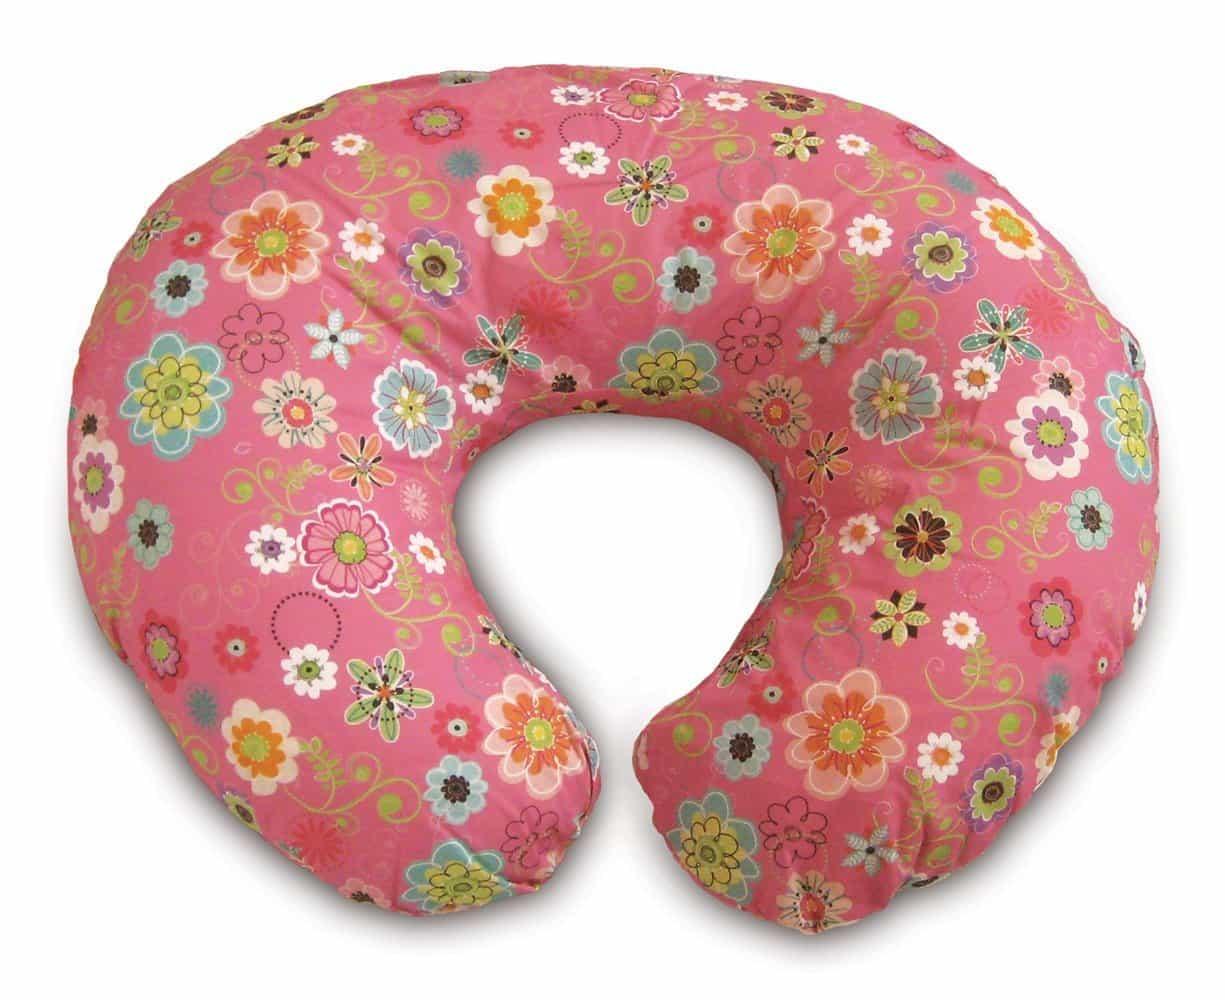 The Best Nursing Pillow (It saved my sanity!)